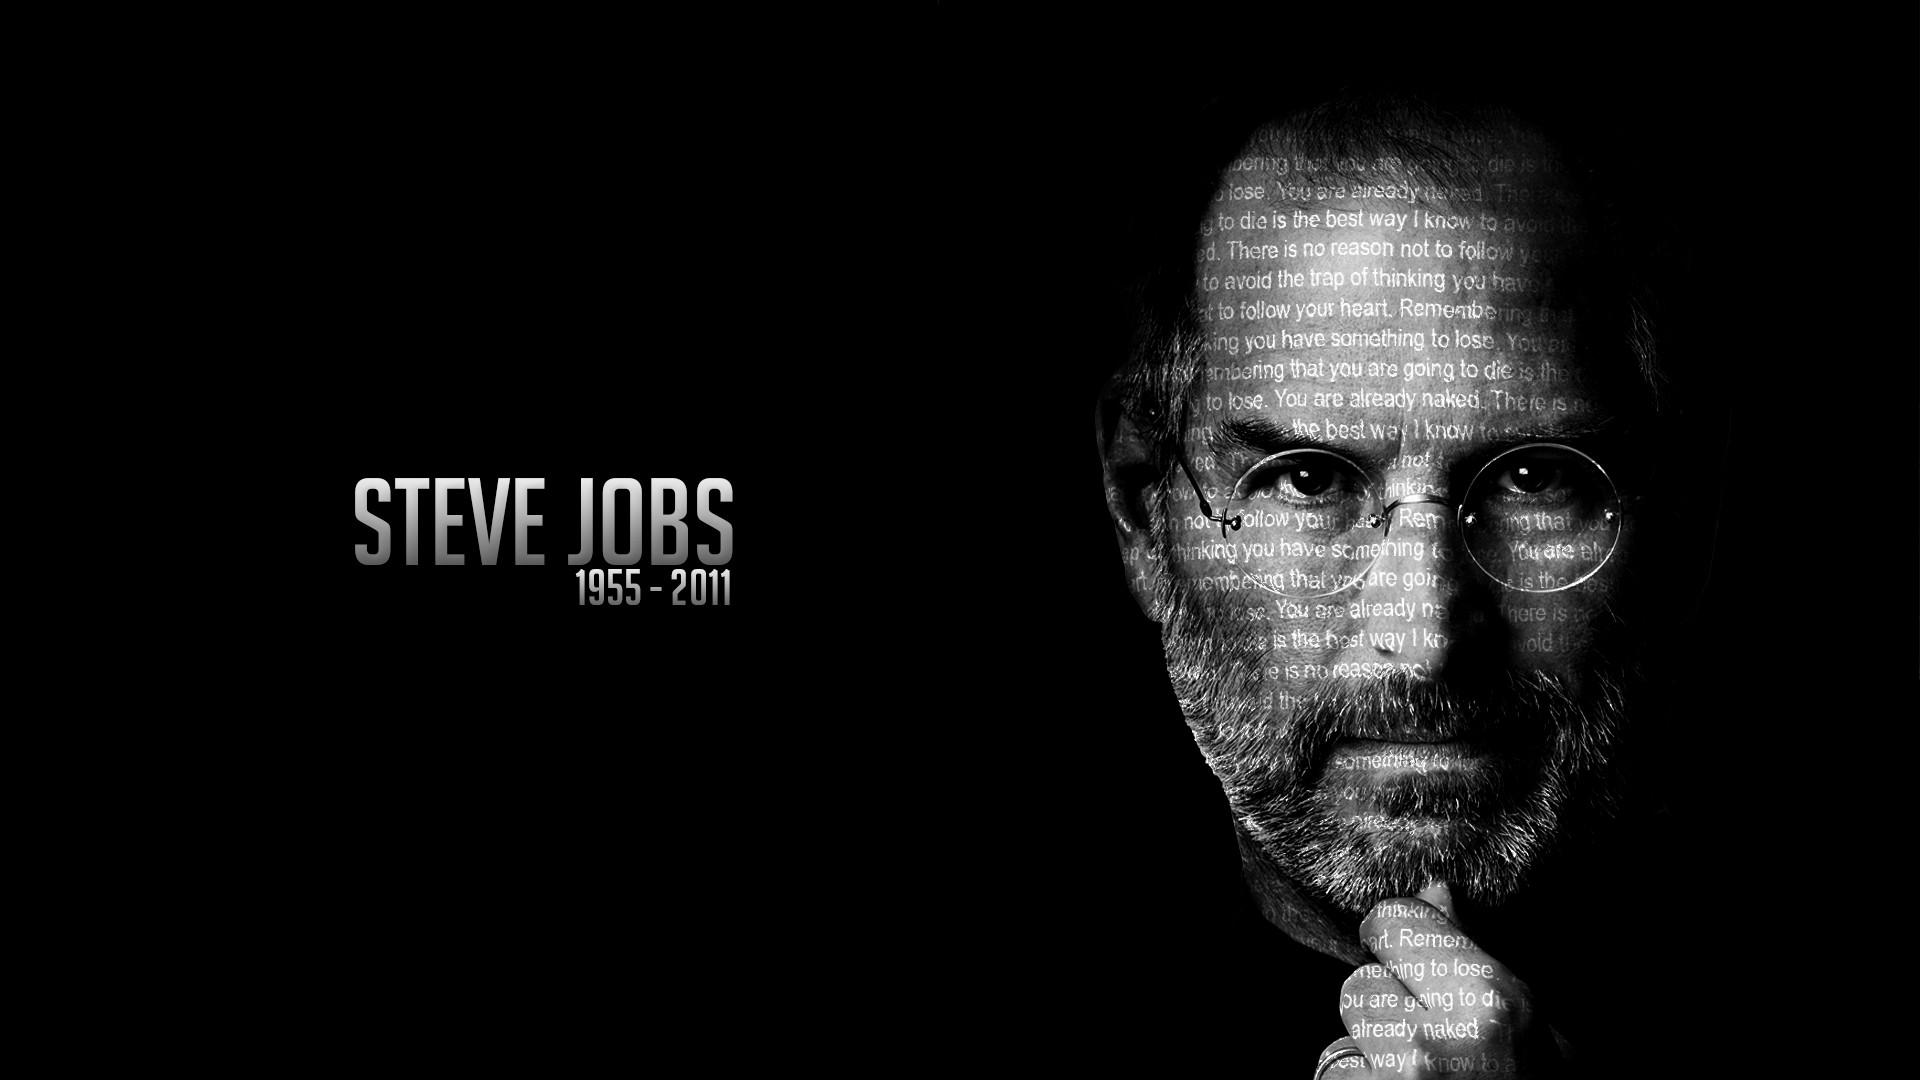 Steve jobs wallpaper 79 images - Steve jobs wallpaper download ...